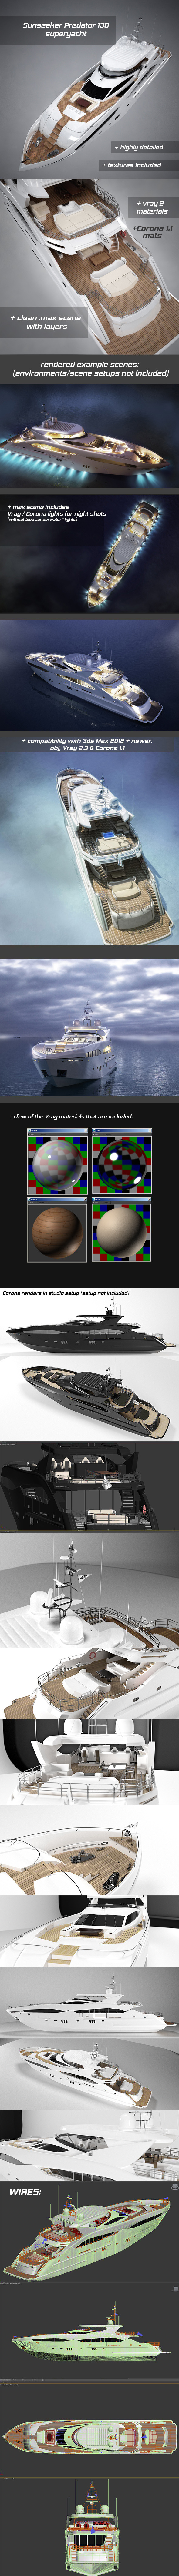 Sunseeker Predator 130 luxury yacht - 3DOcean Item for Sale